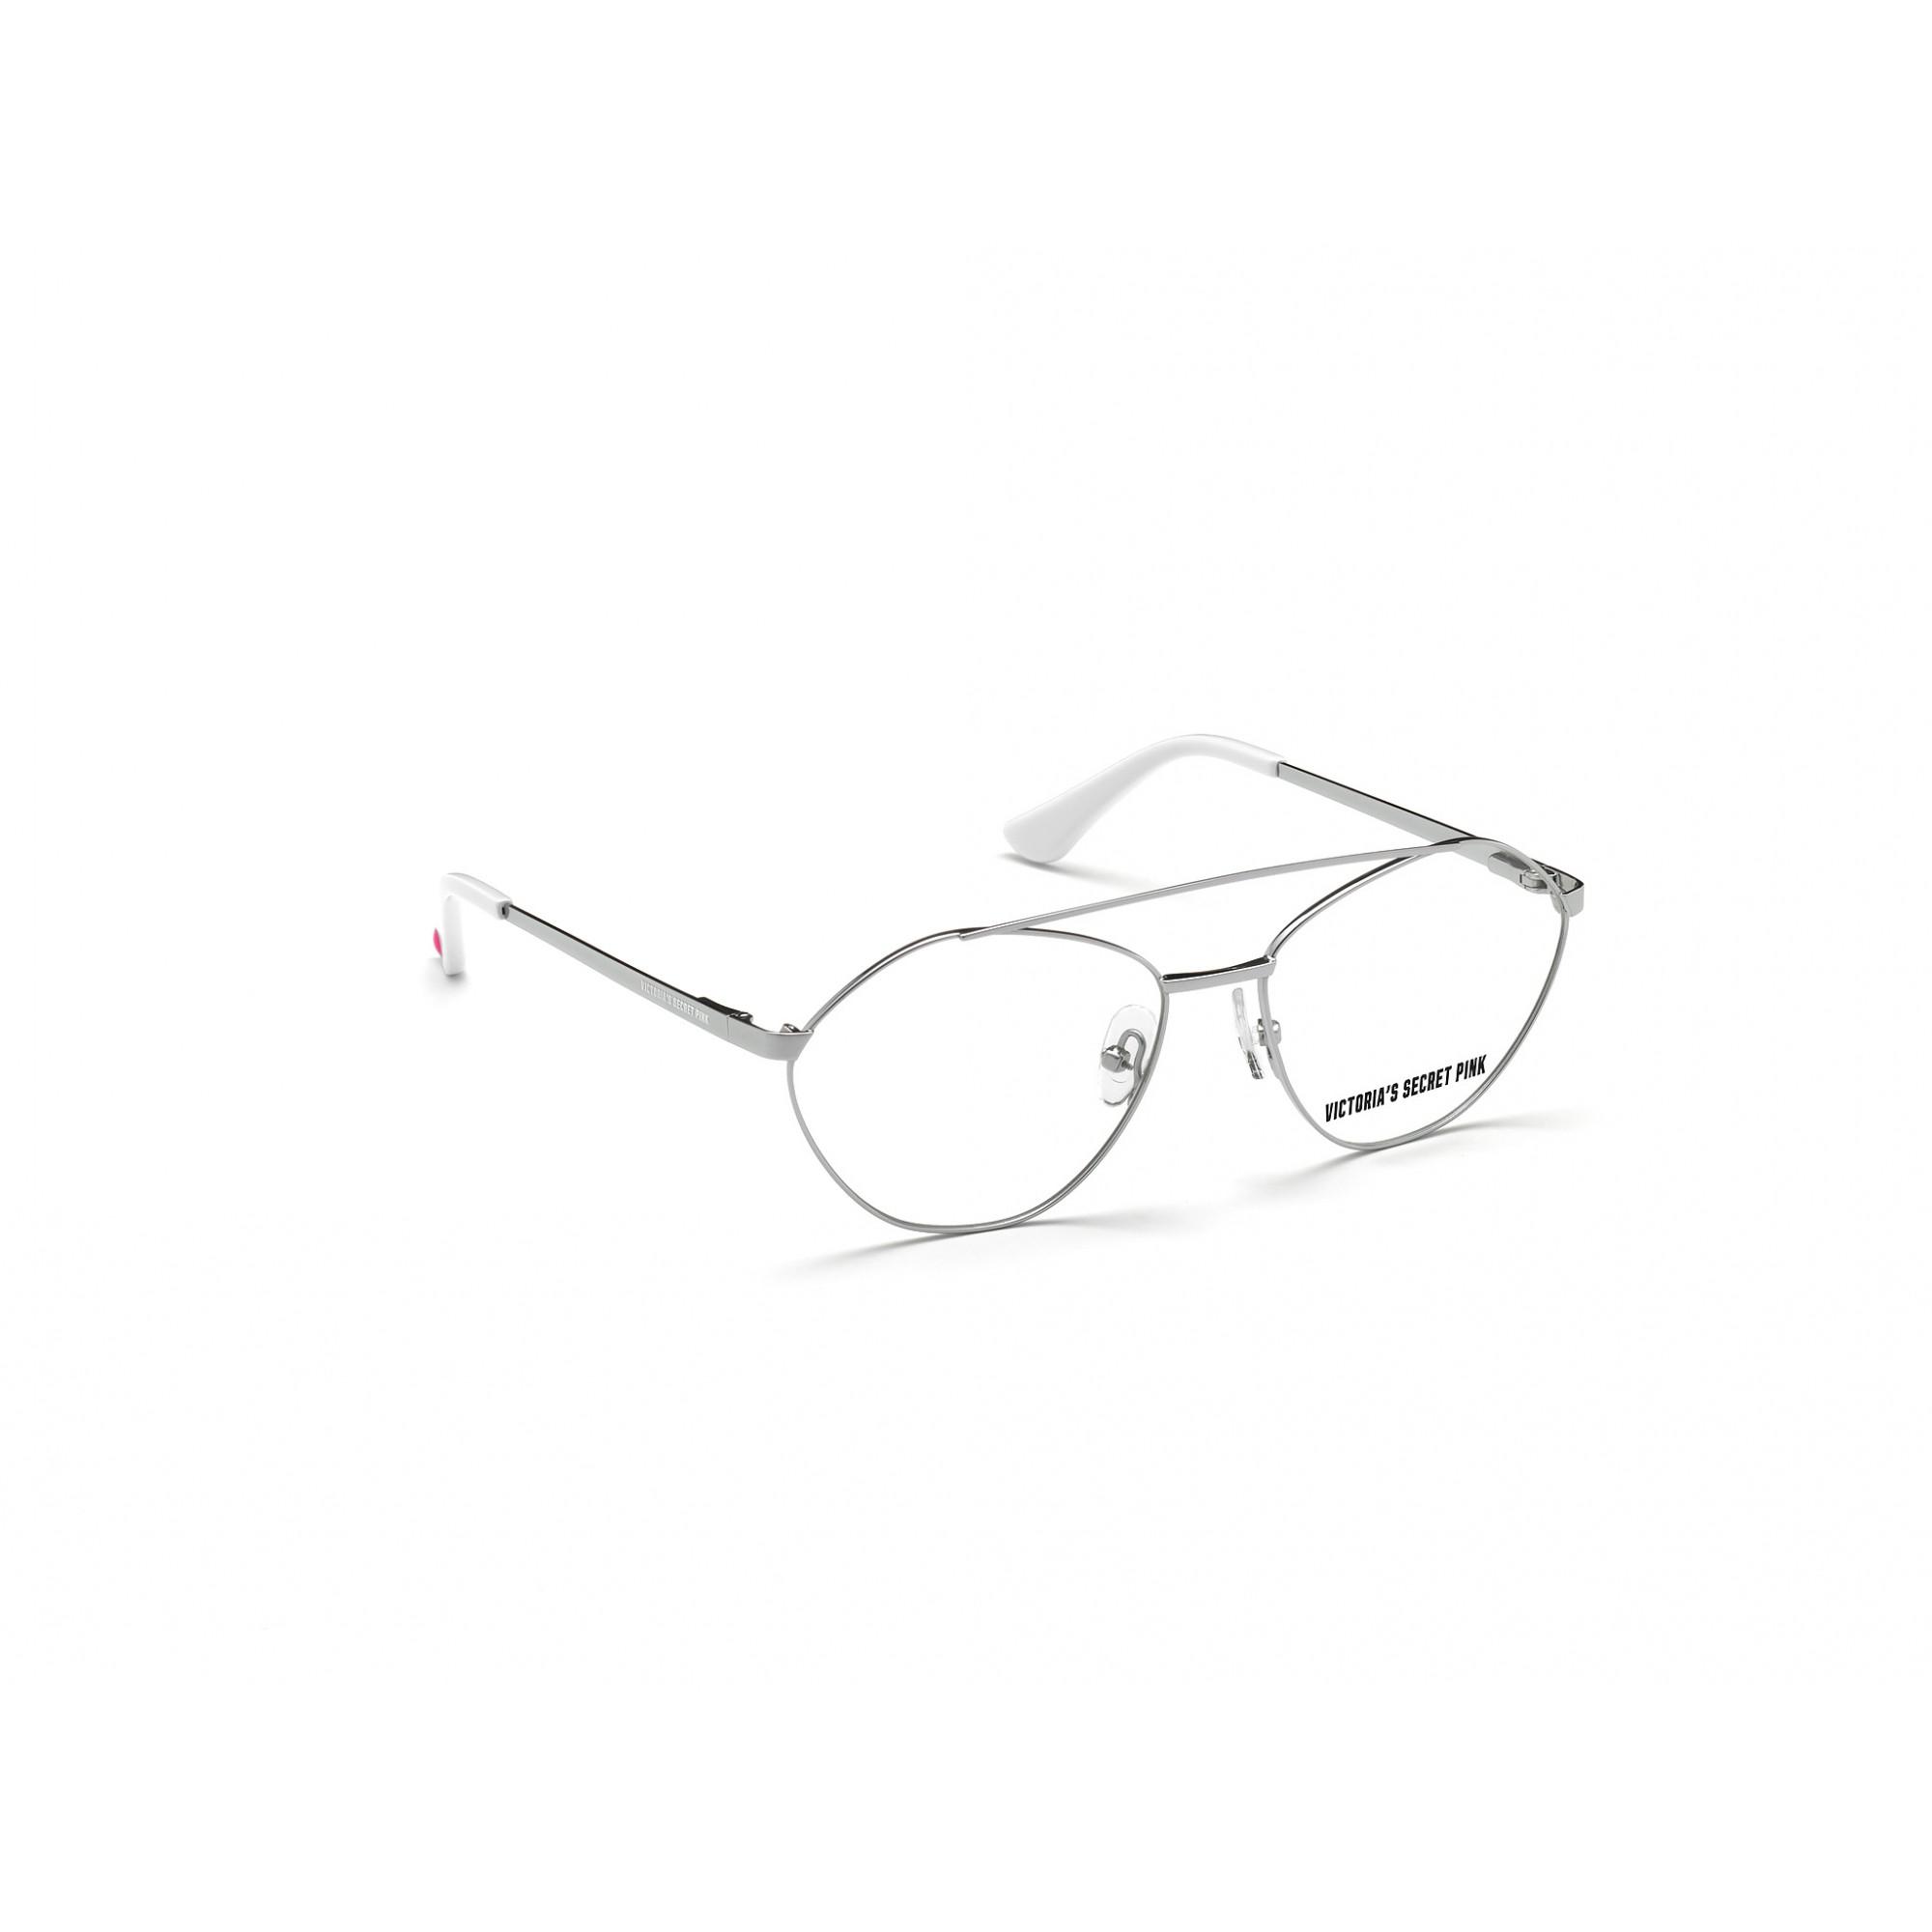 Victoria's Secret Pink - PK5001 016 56 - Óculos de grau